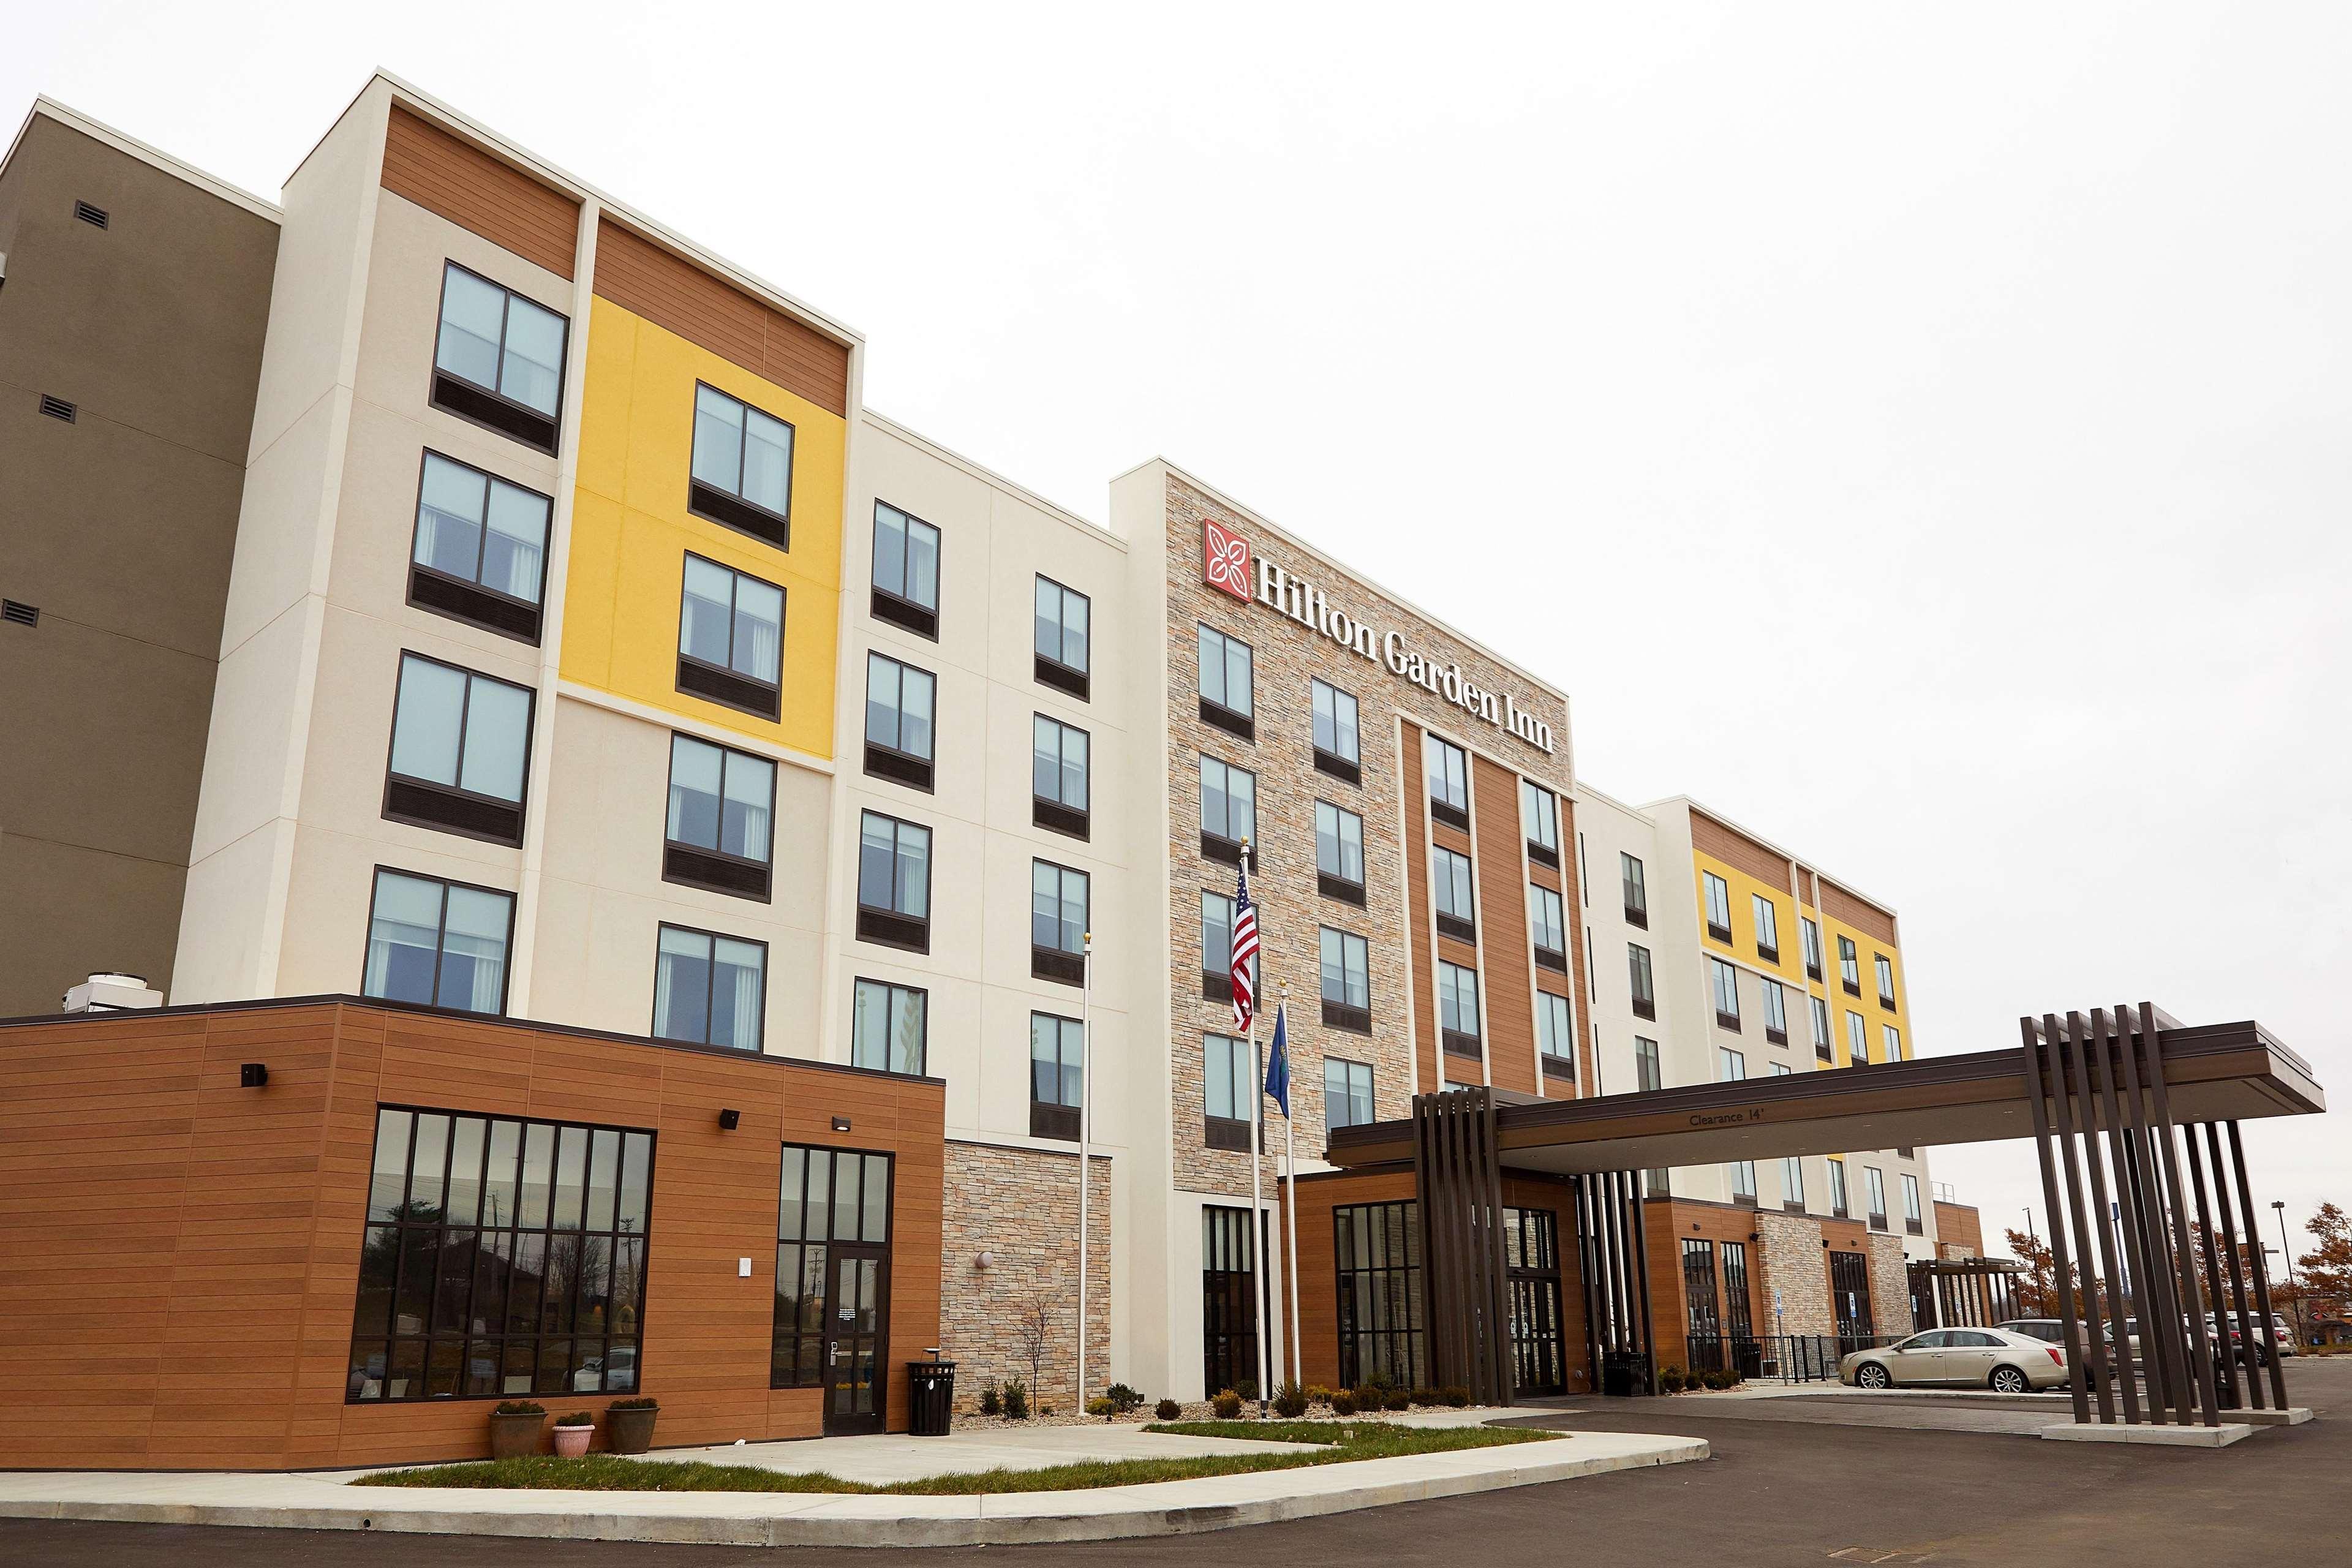 Hilton Garden Inn Elizabethtown image 0